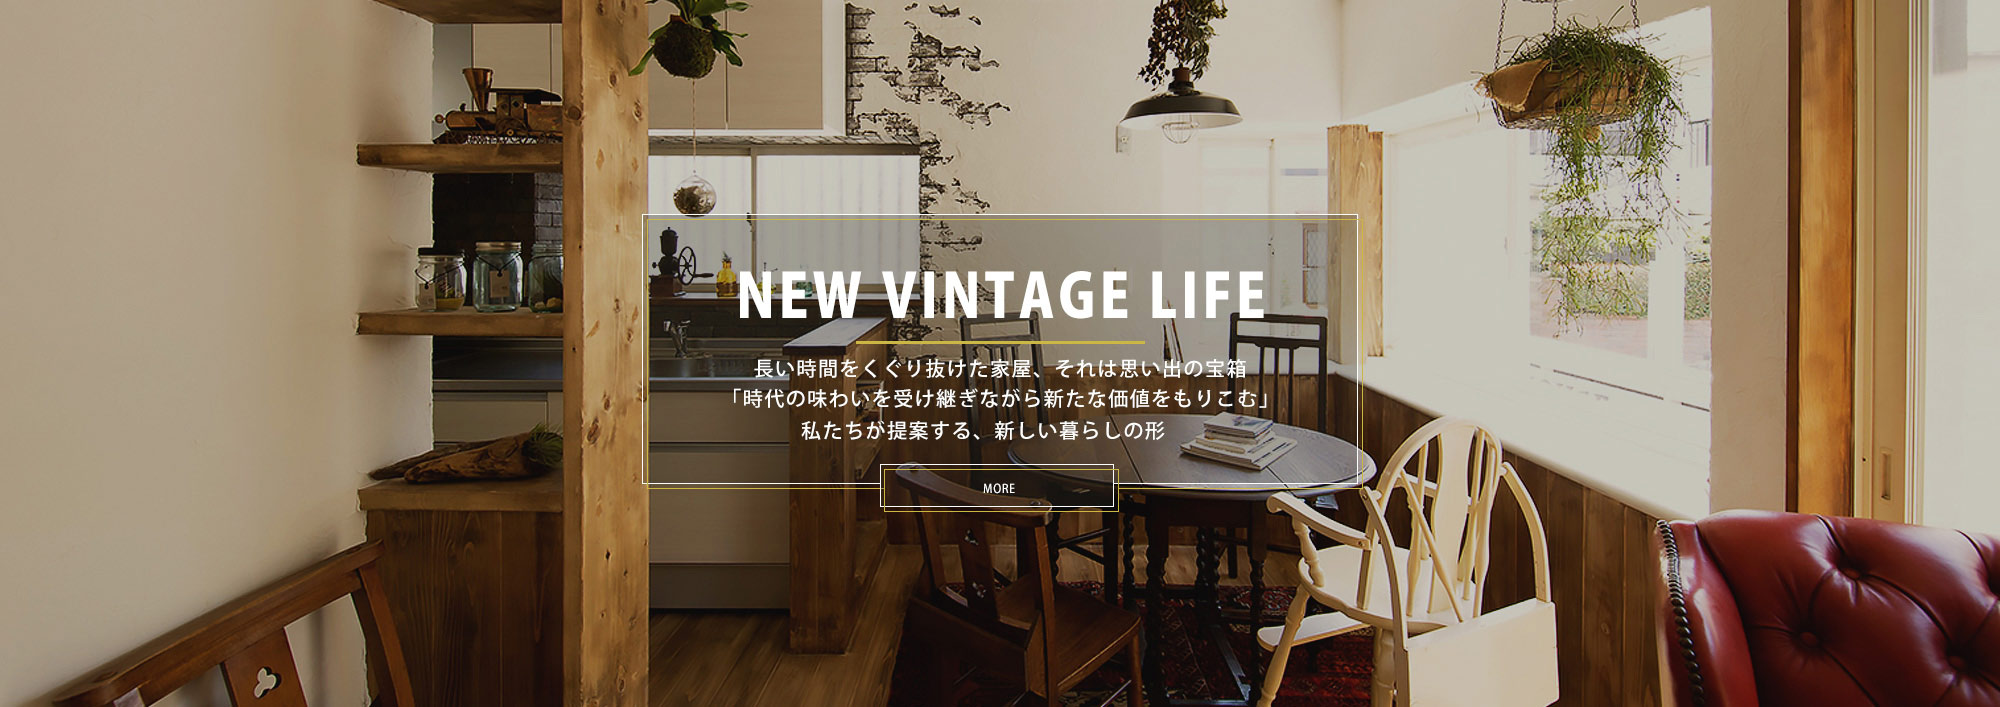 NEW VINTAGE LIFE 私たちが提案する、新しい暮らしの形